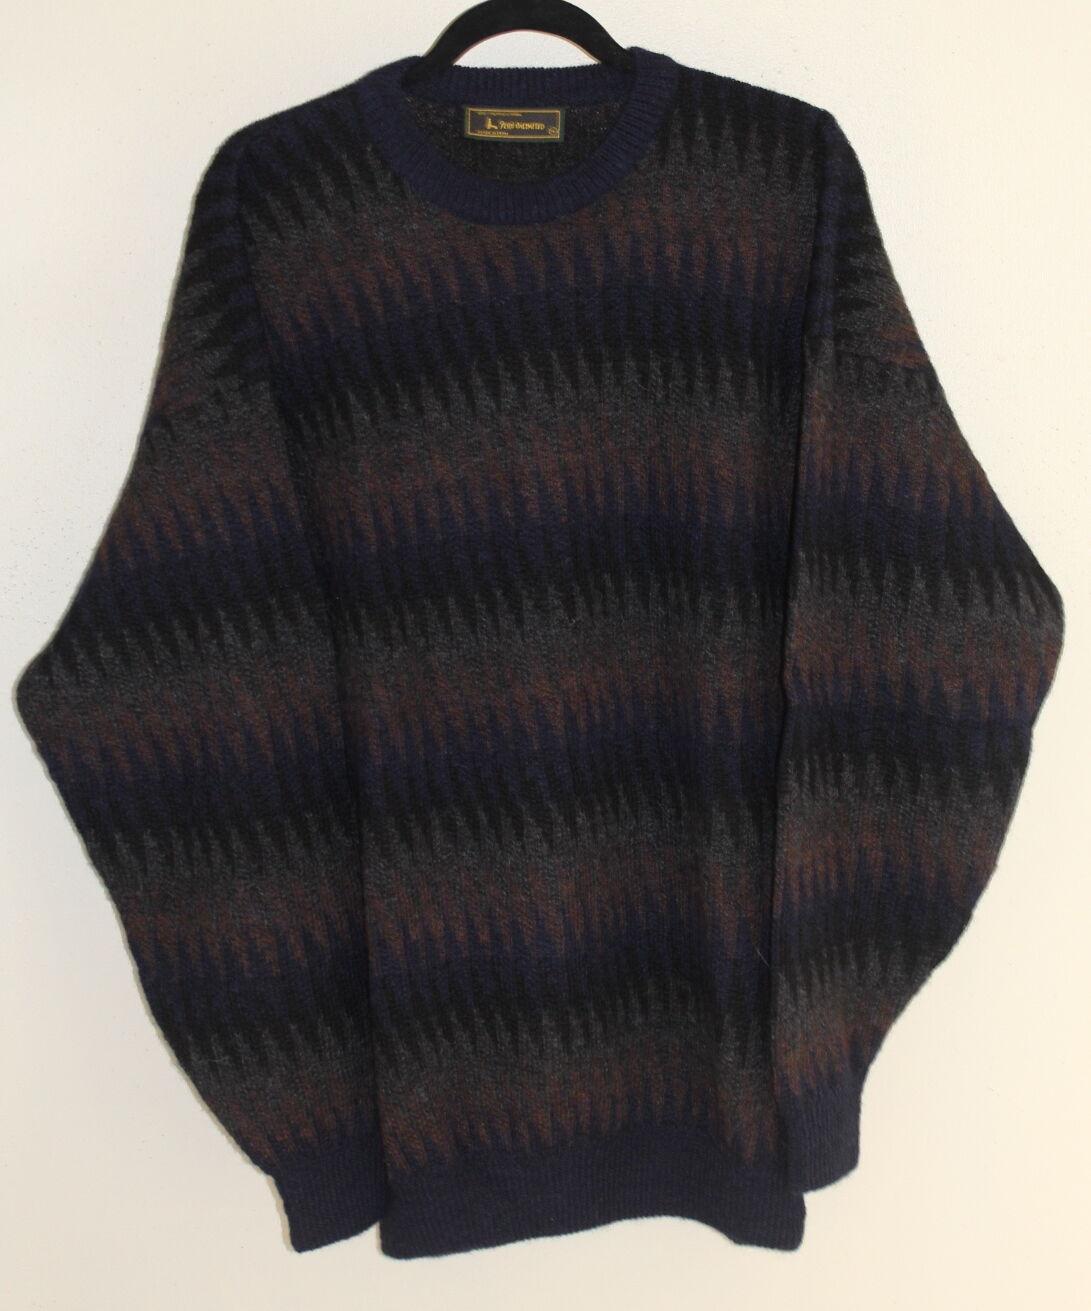 Peru Unlimited  Artistic 100% Alpaca Wool Zig-Zag Plush Luxury Sweater Sz XL